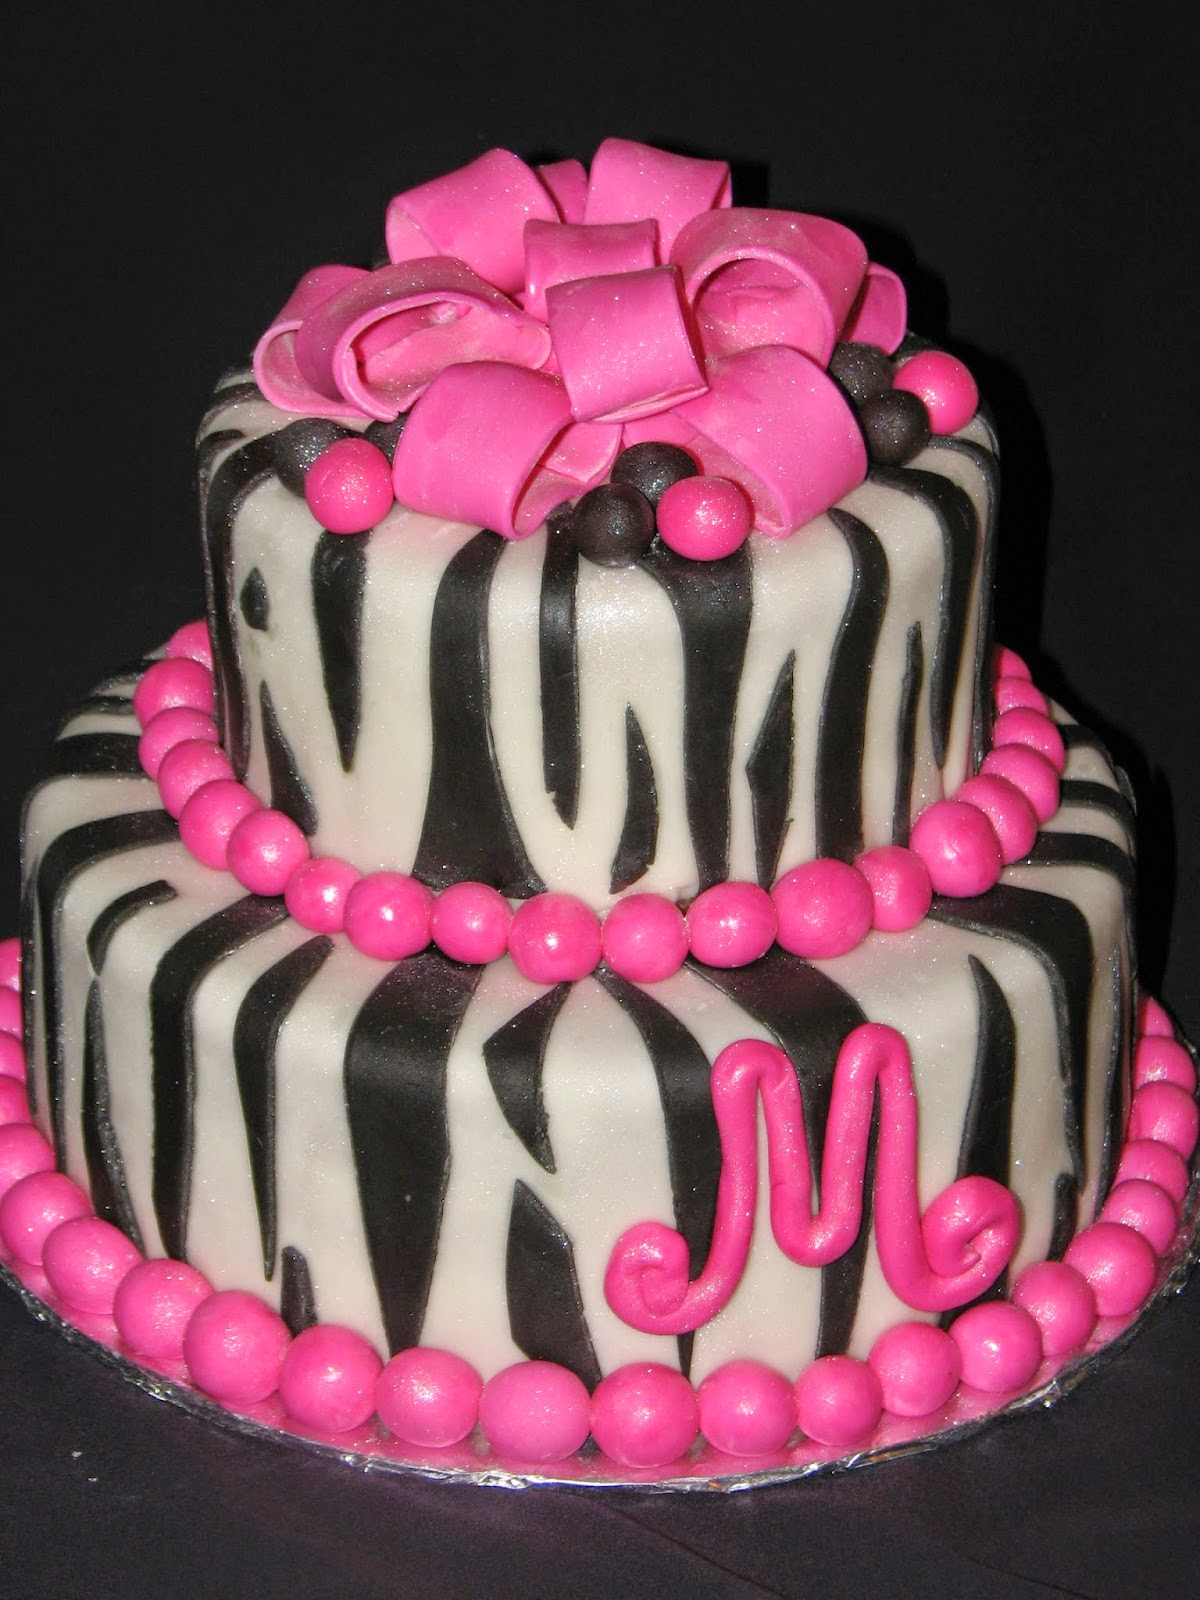 Best happy birthday cake images 2015 happy birthday cake best best happy birthday cake images 2015 happy birthday cake happy new year wallpapers 2016 happy birthday publicscrutiny Choice Image